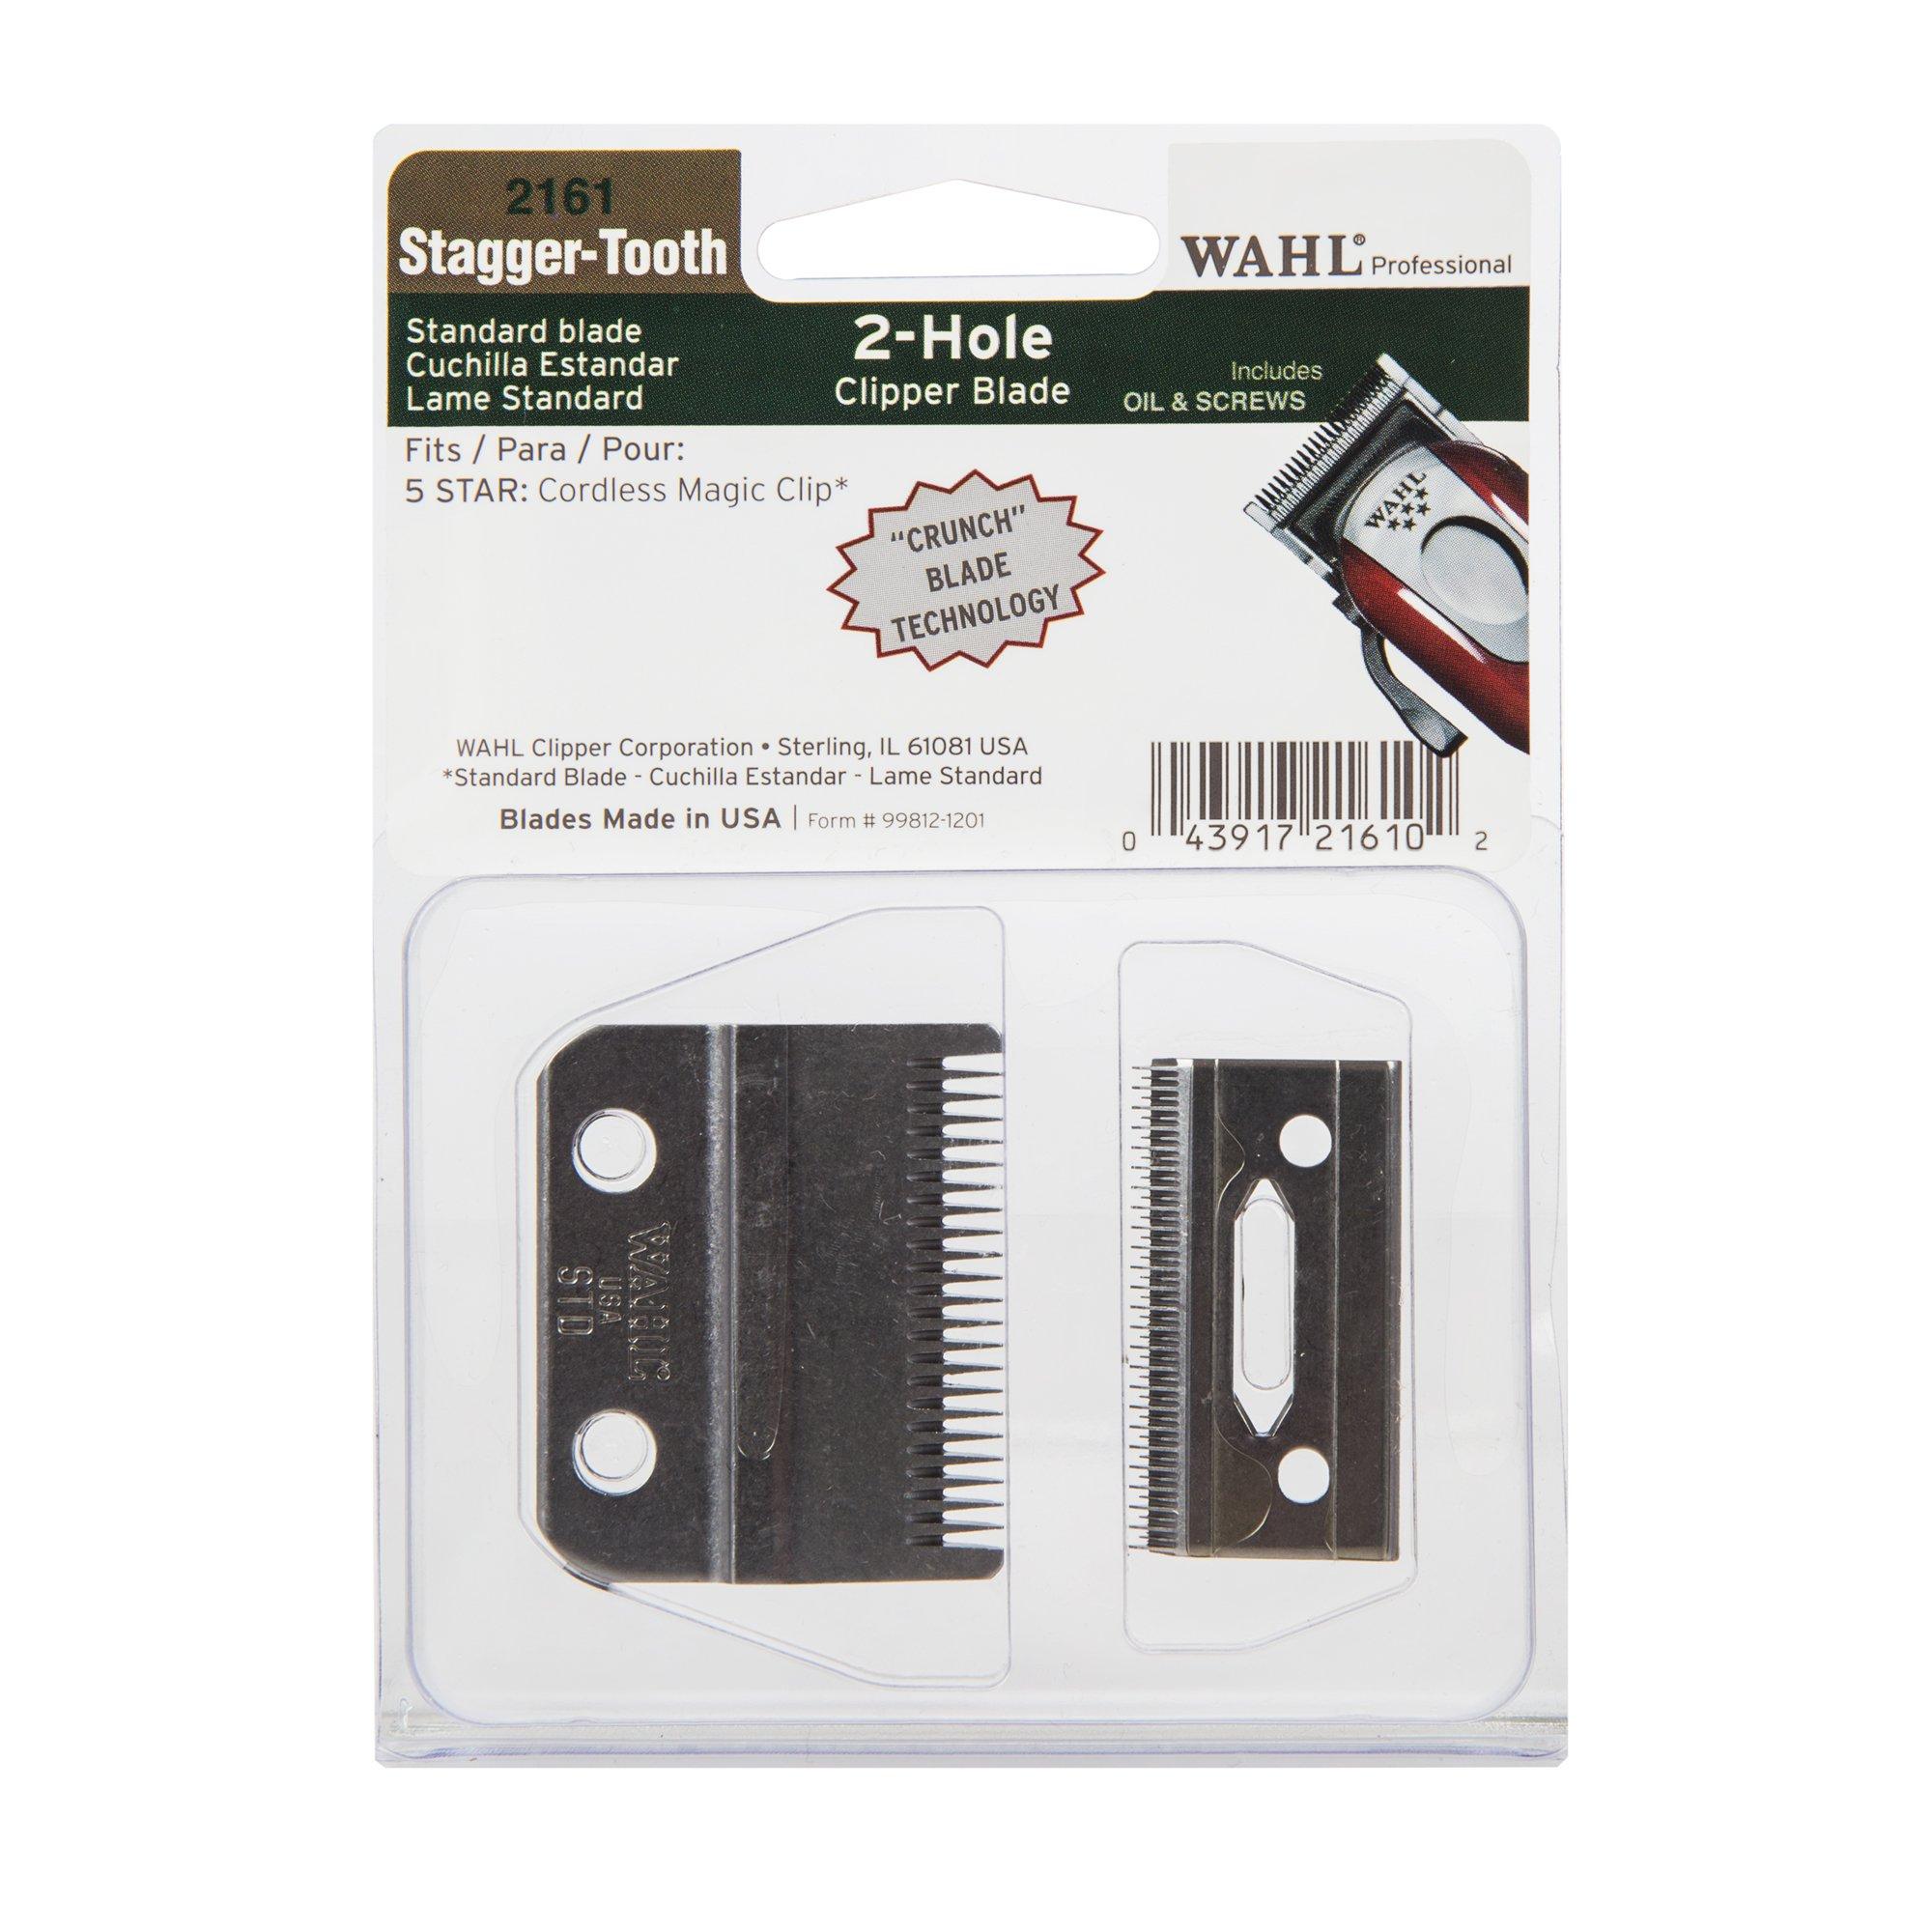 WAHL Magic Clip Cordless vágófej 2161-400 empty bd537df005